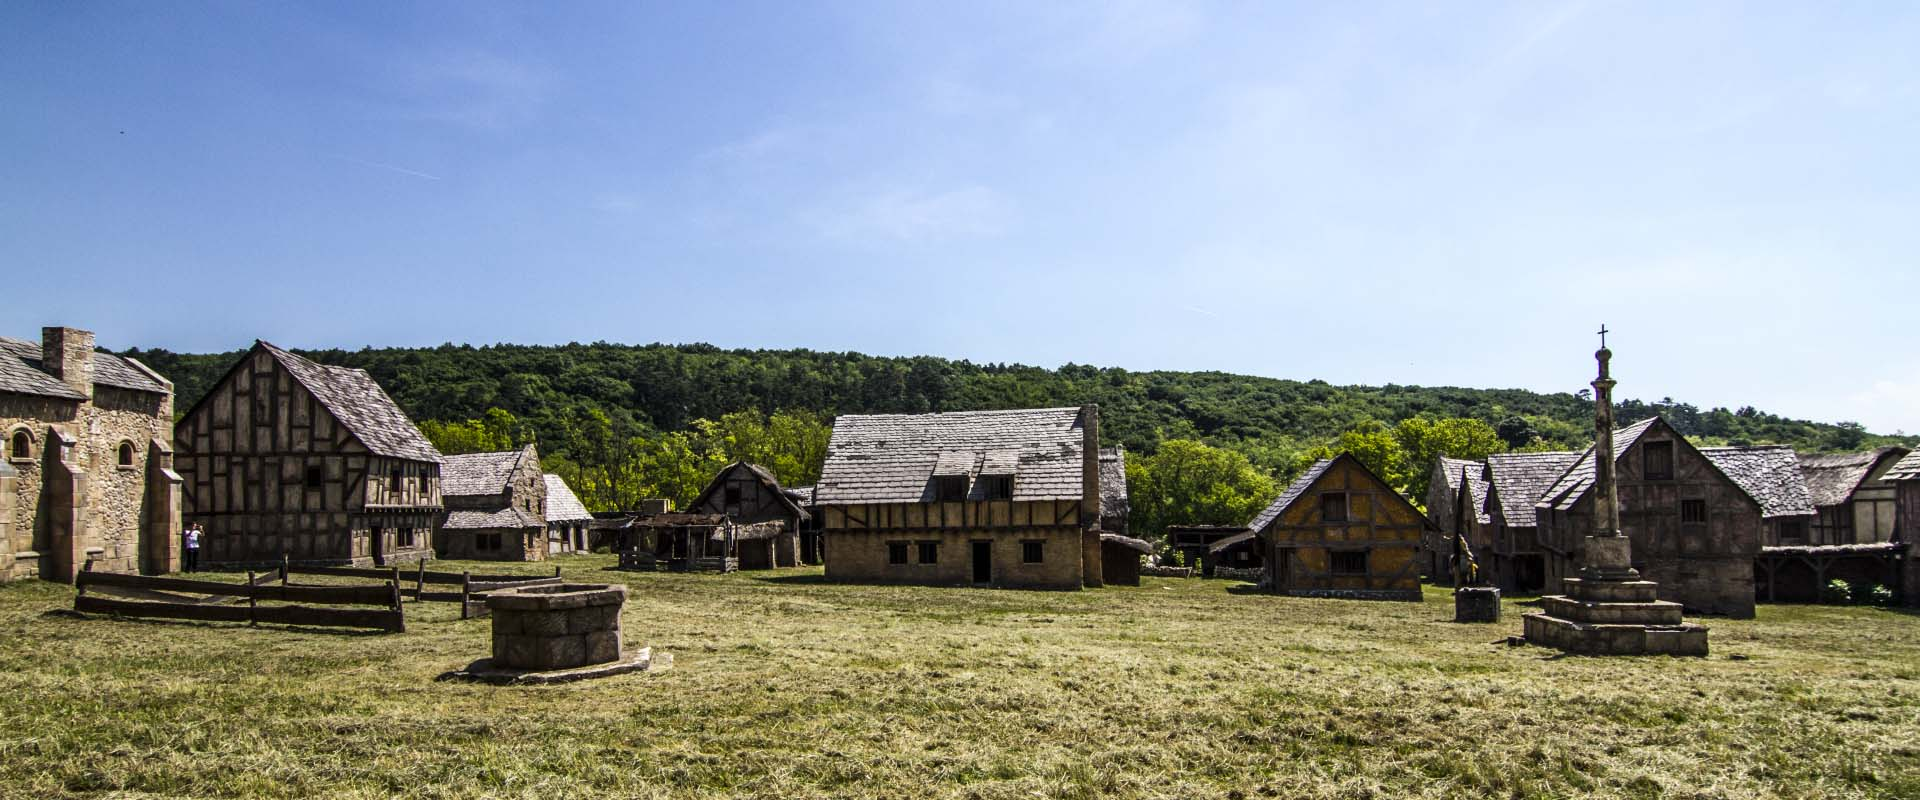 1-Korda-Studios-Medieval-backlot-set-4